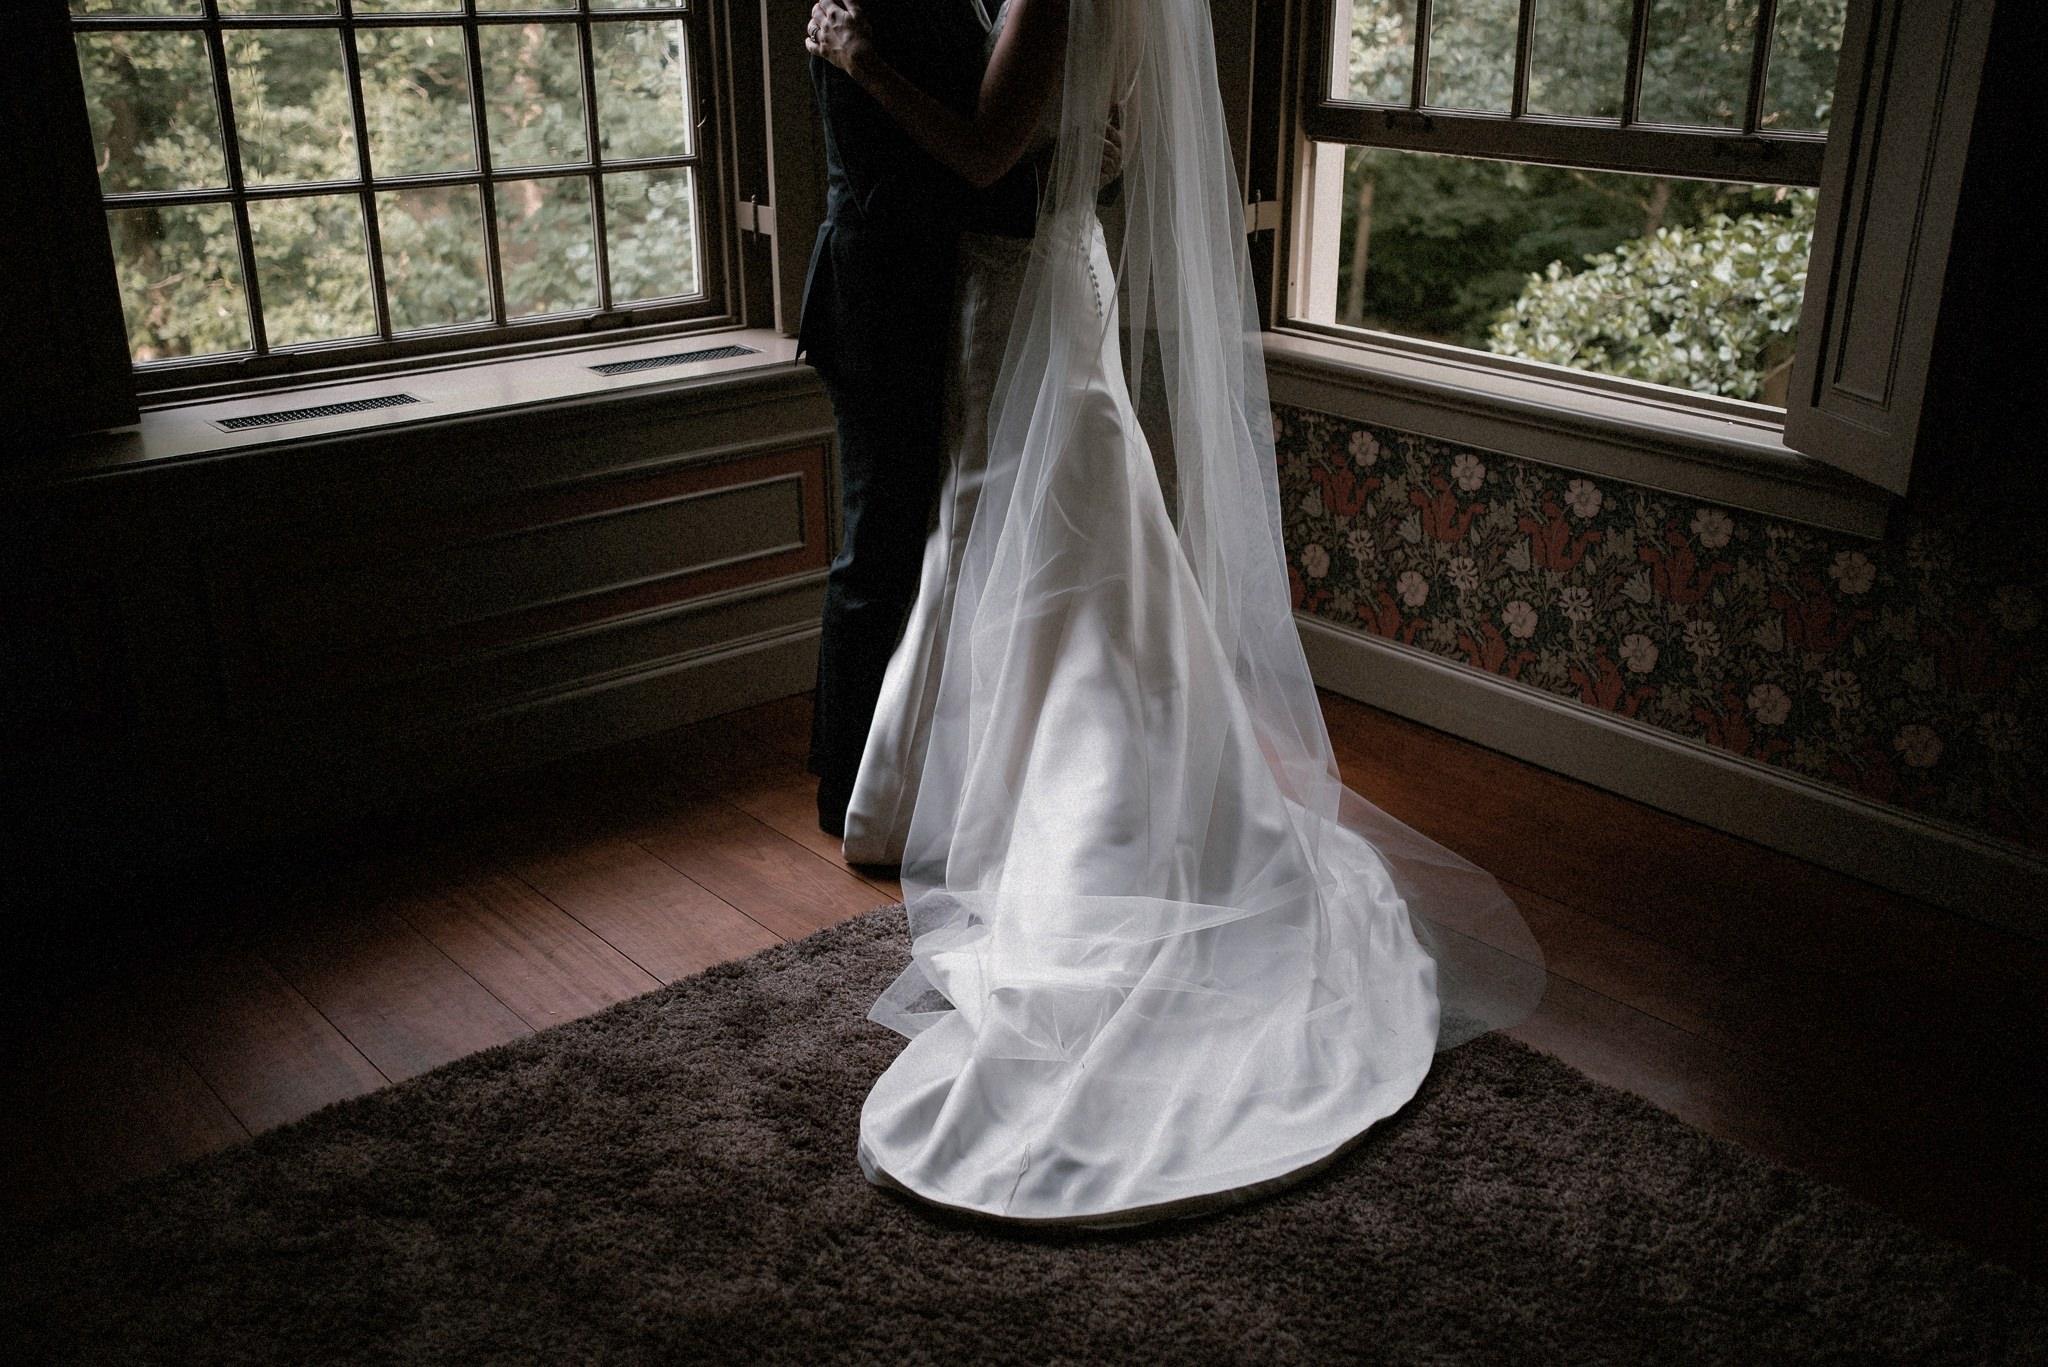 Bruidsfotografie Buitenplaats Sparrendaal - Naomi van der Kraan 0061.jpg